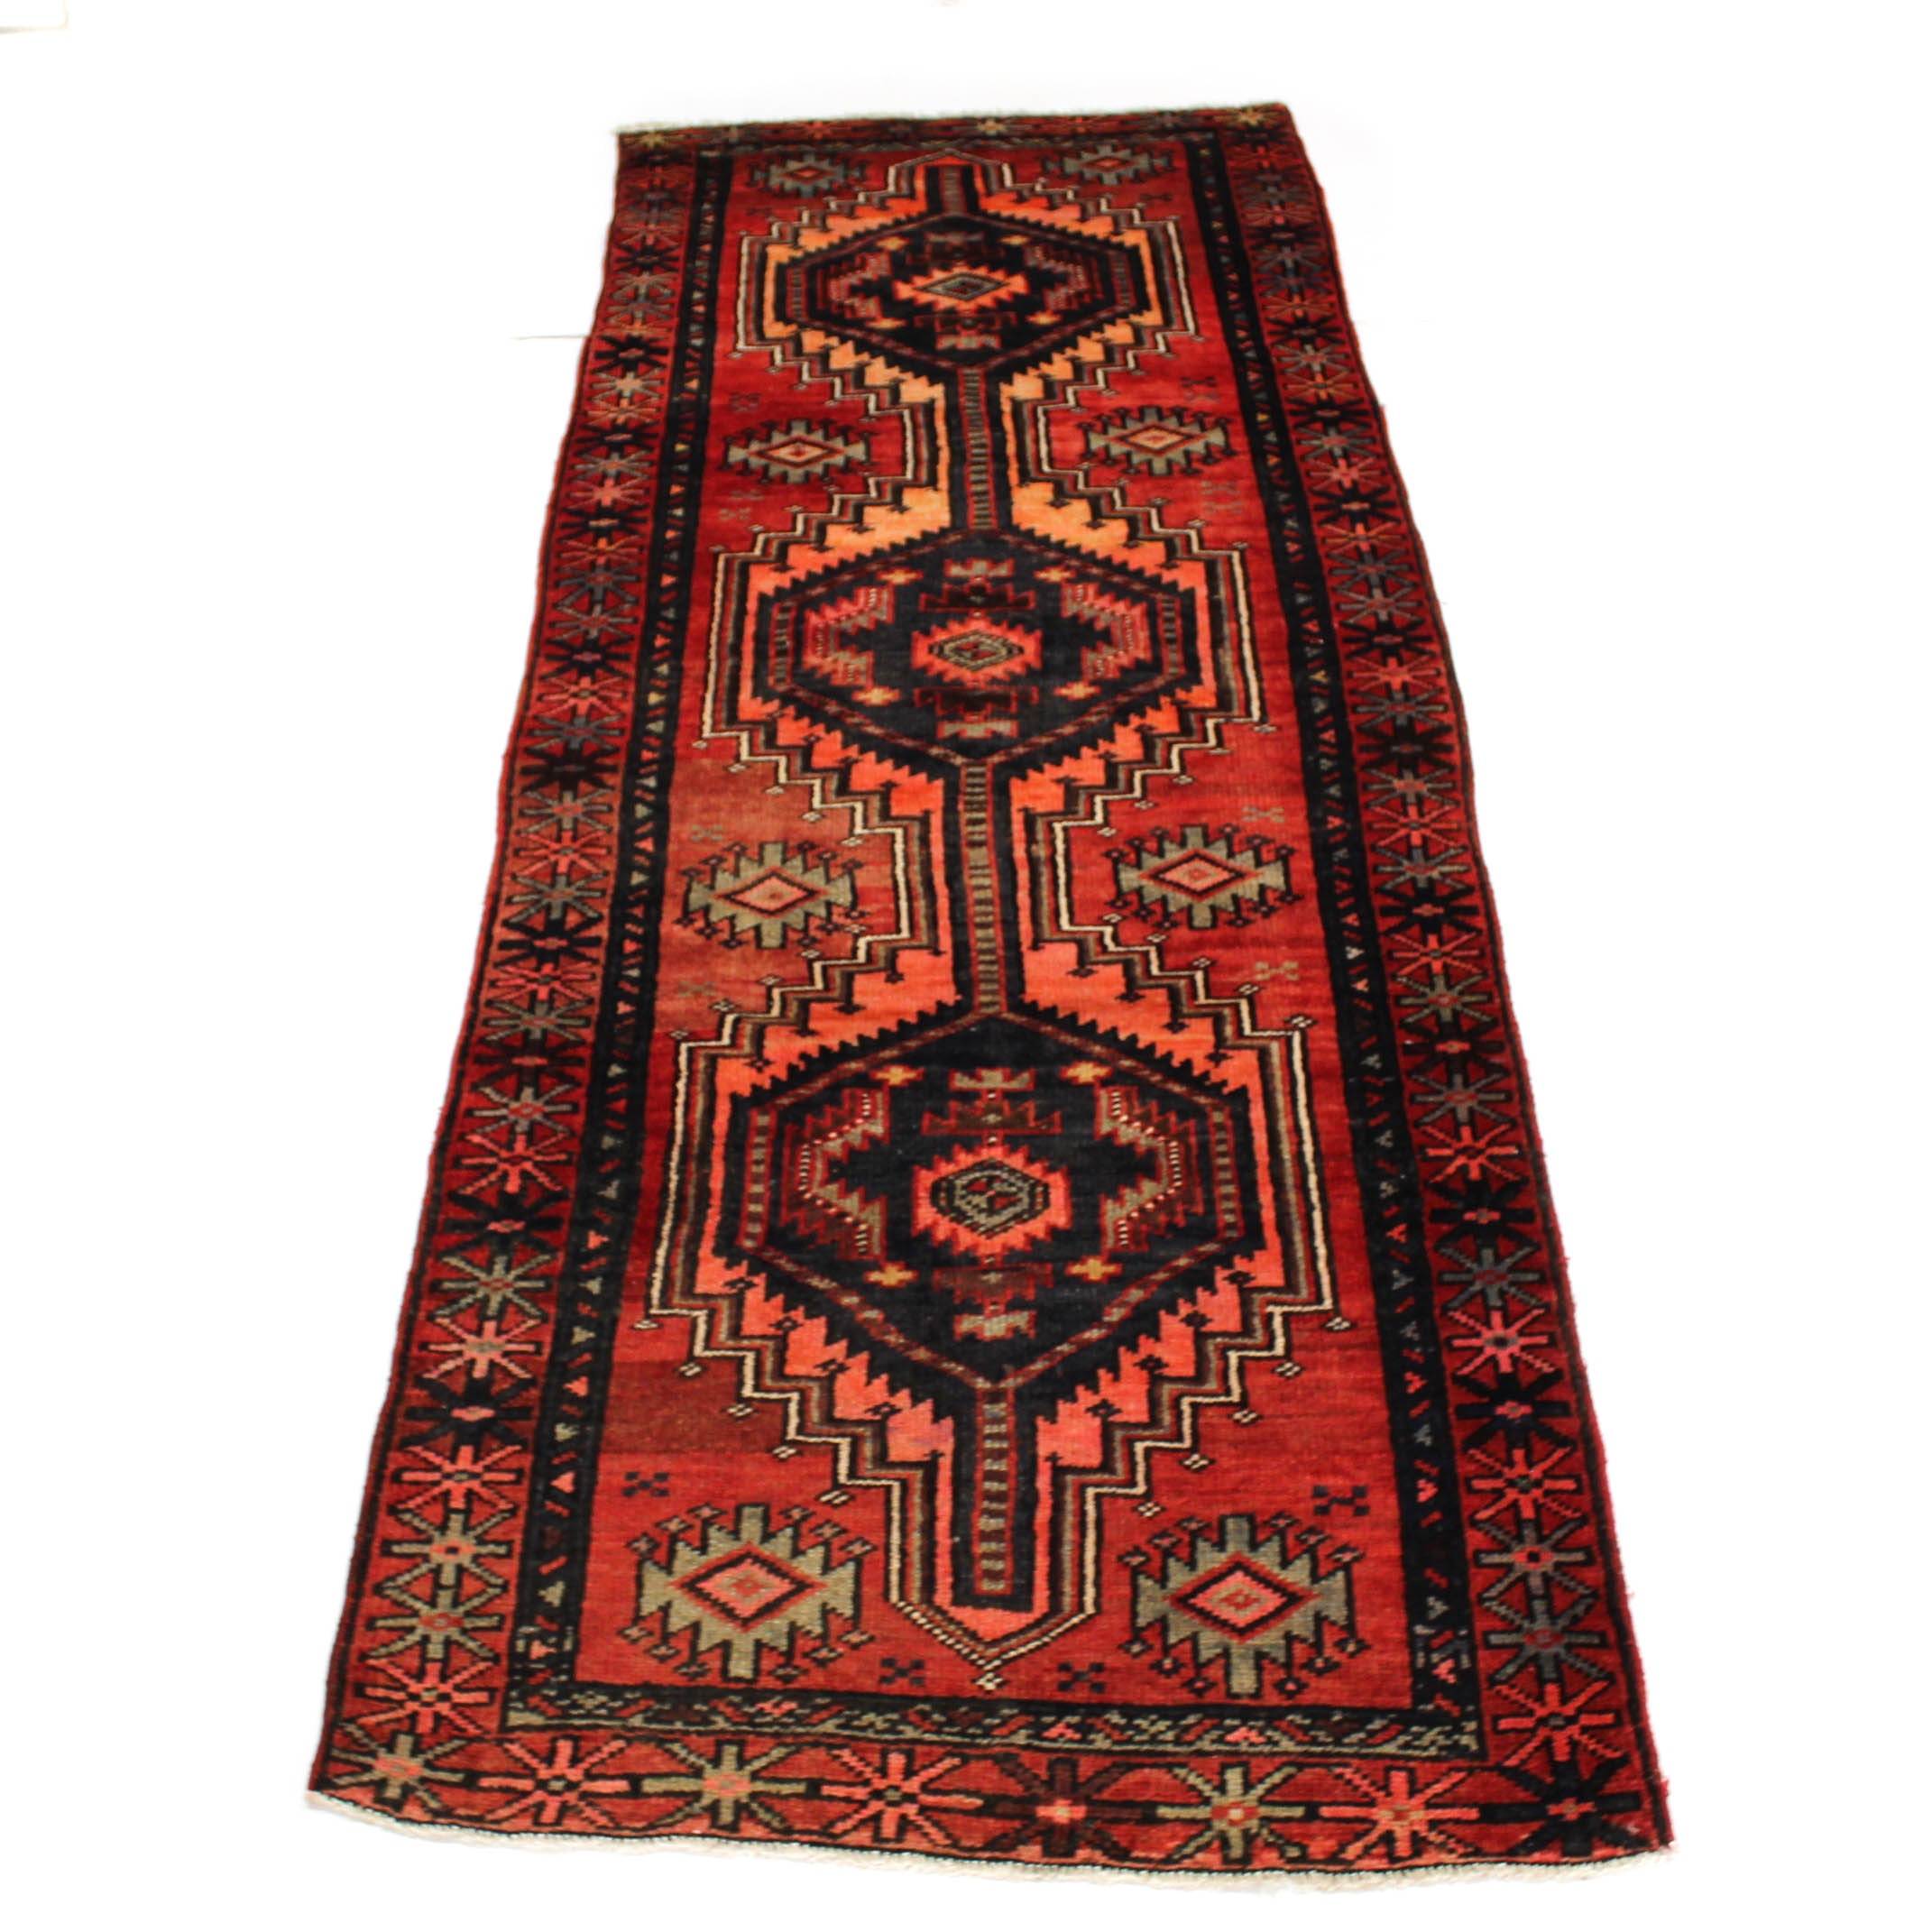 3'8 x 10' Semi-Antique Hand-Knotted Persian Zanjan Carpet Runner